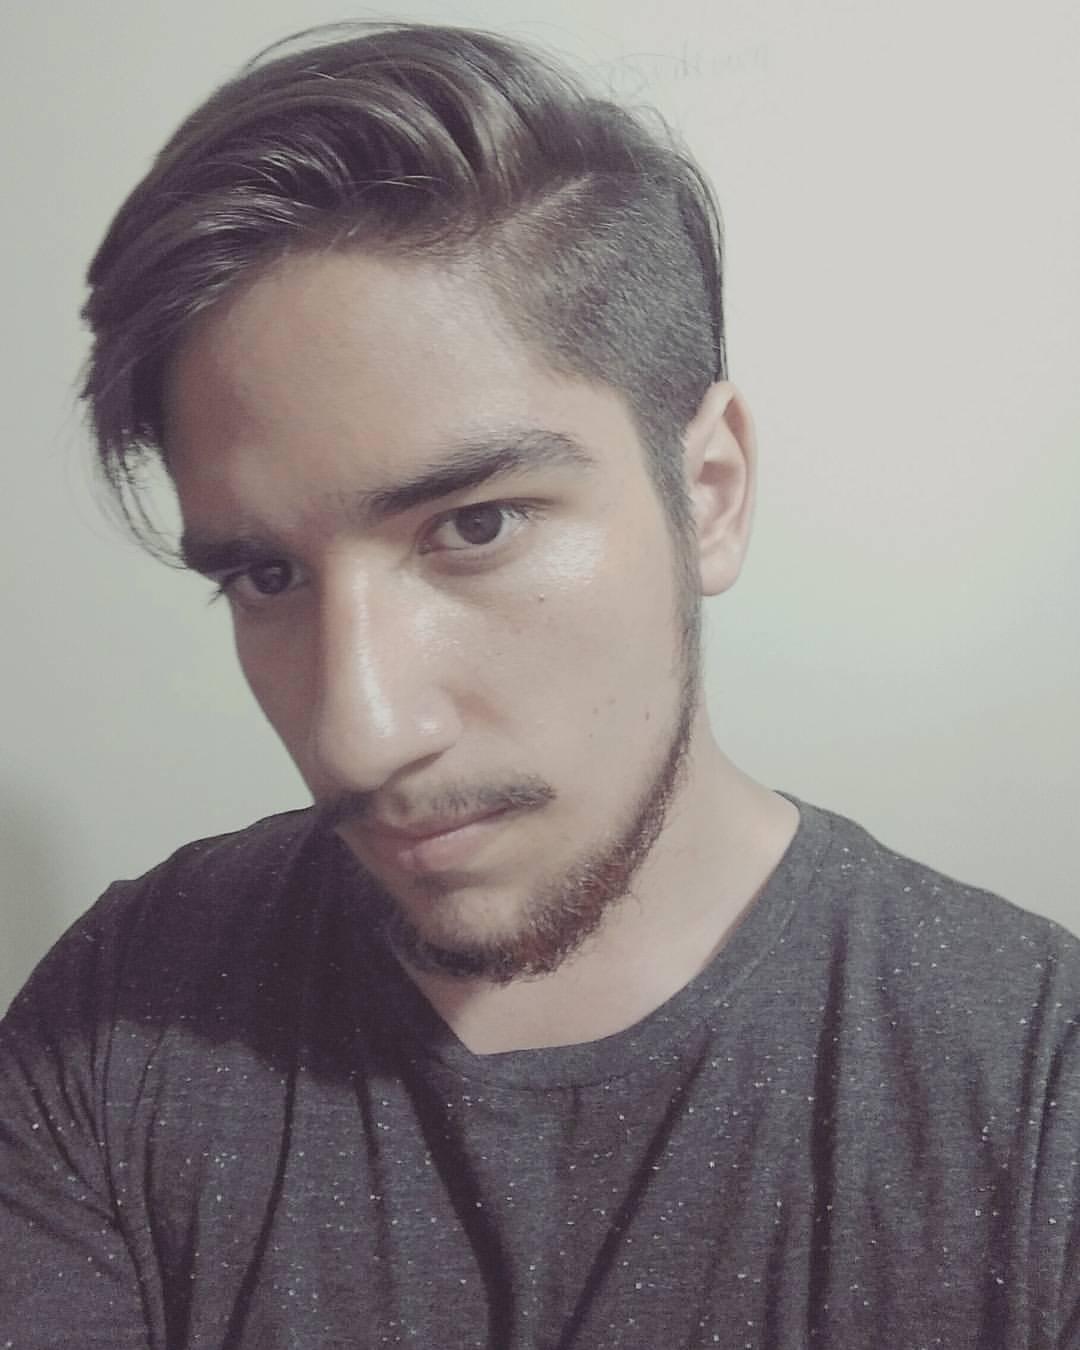 Go to Oscar Roncal Martínez's profile